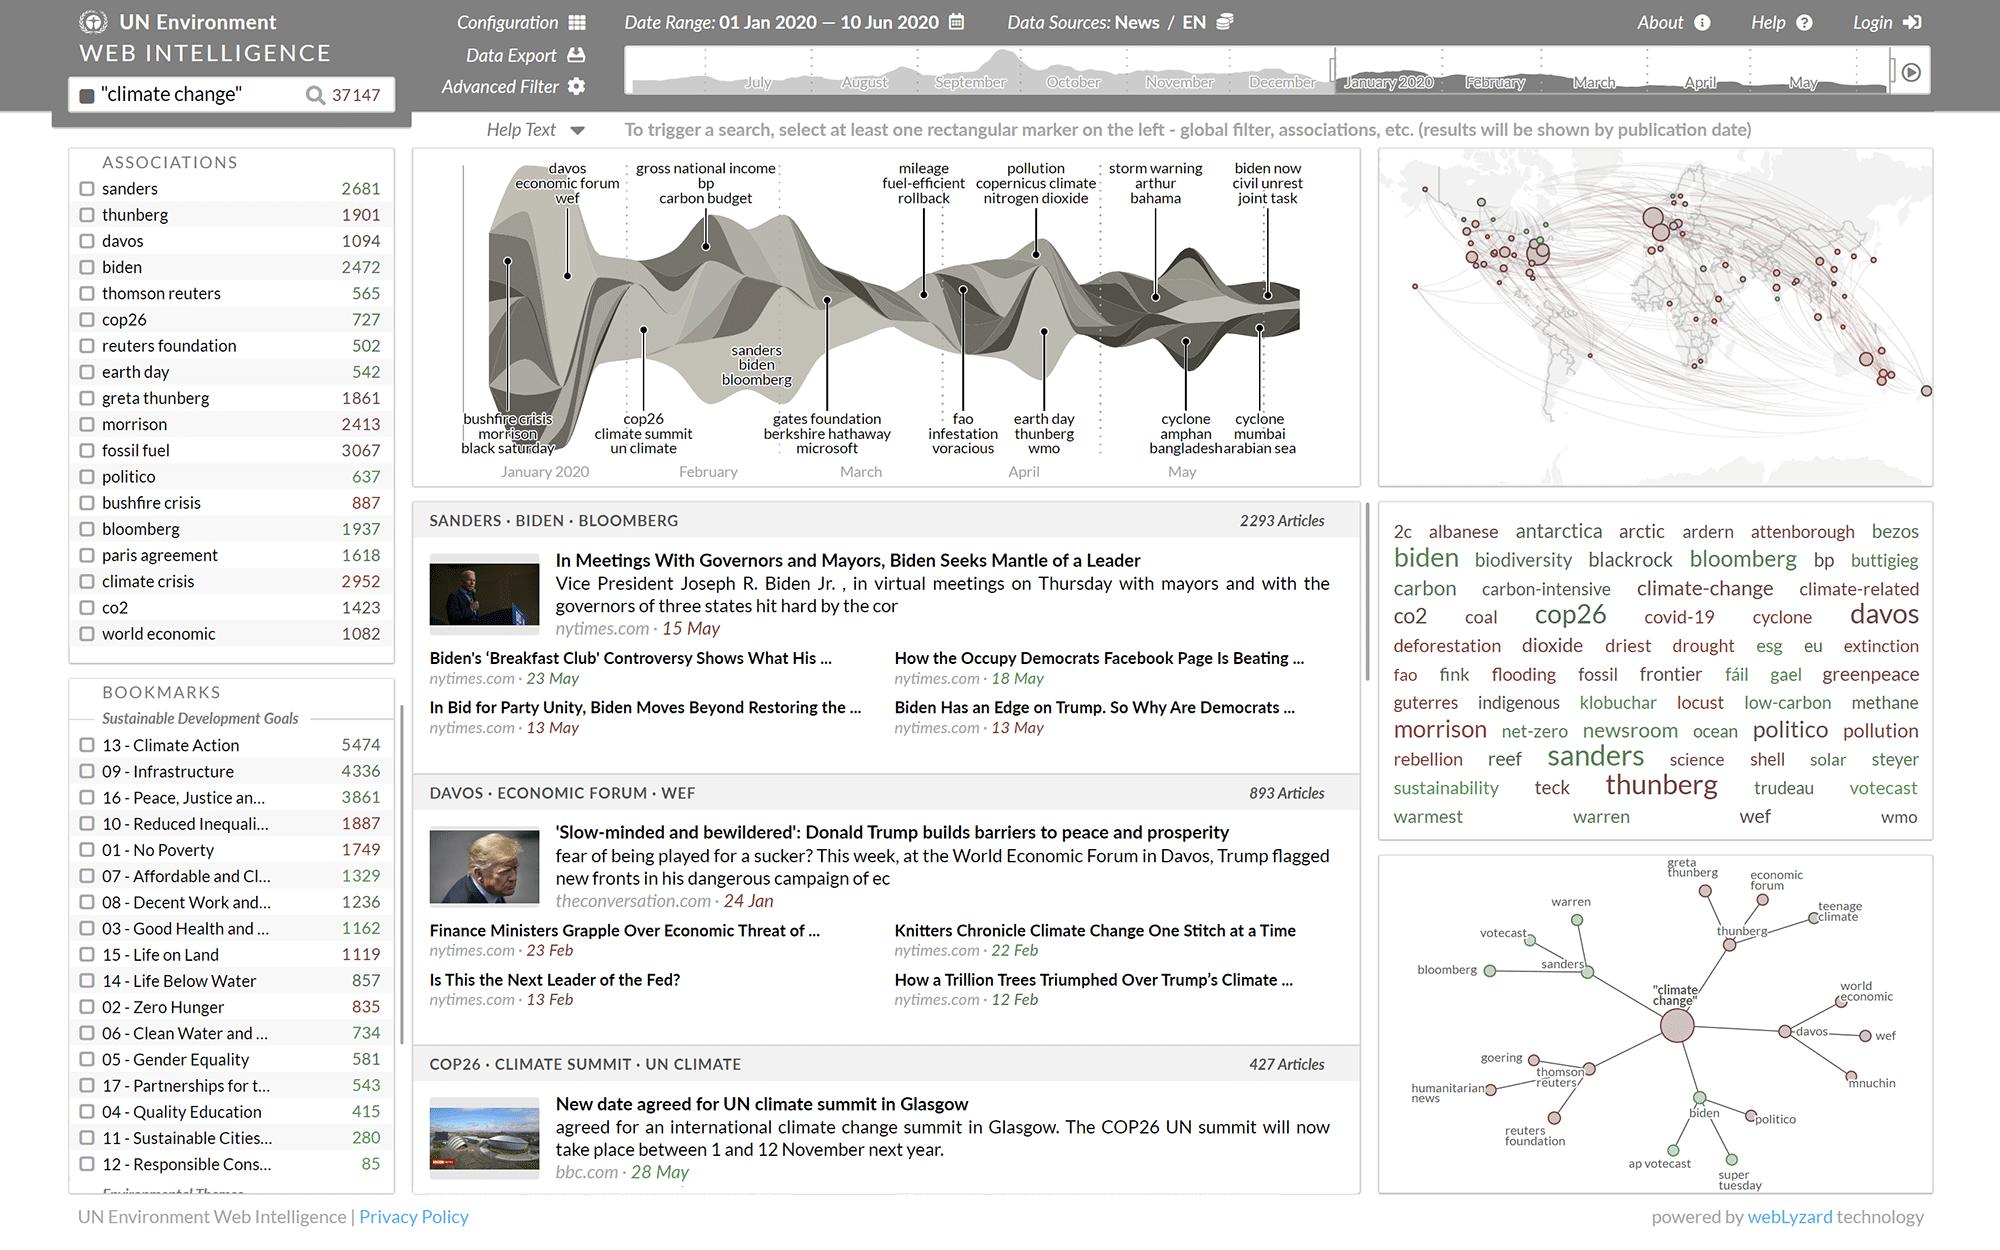 UNEP Live Web Intelligence Dashboard